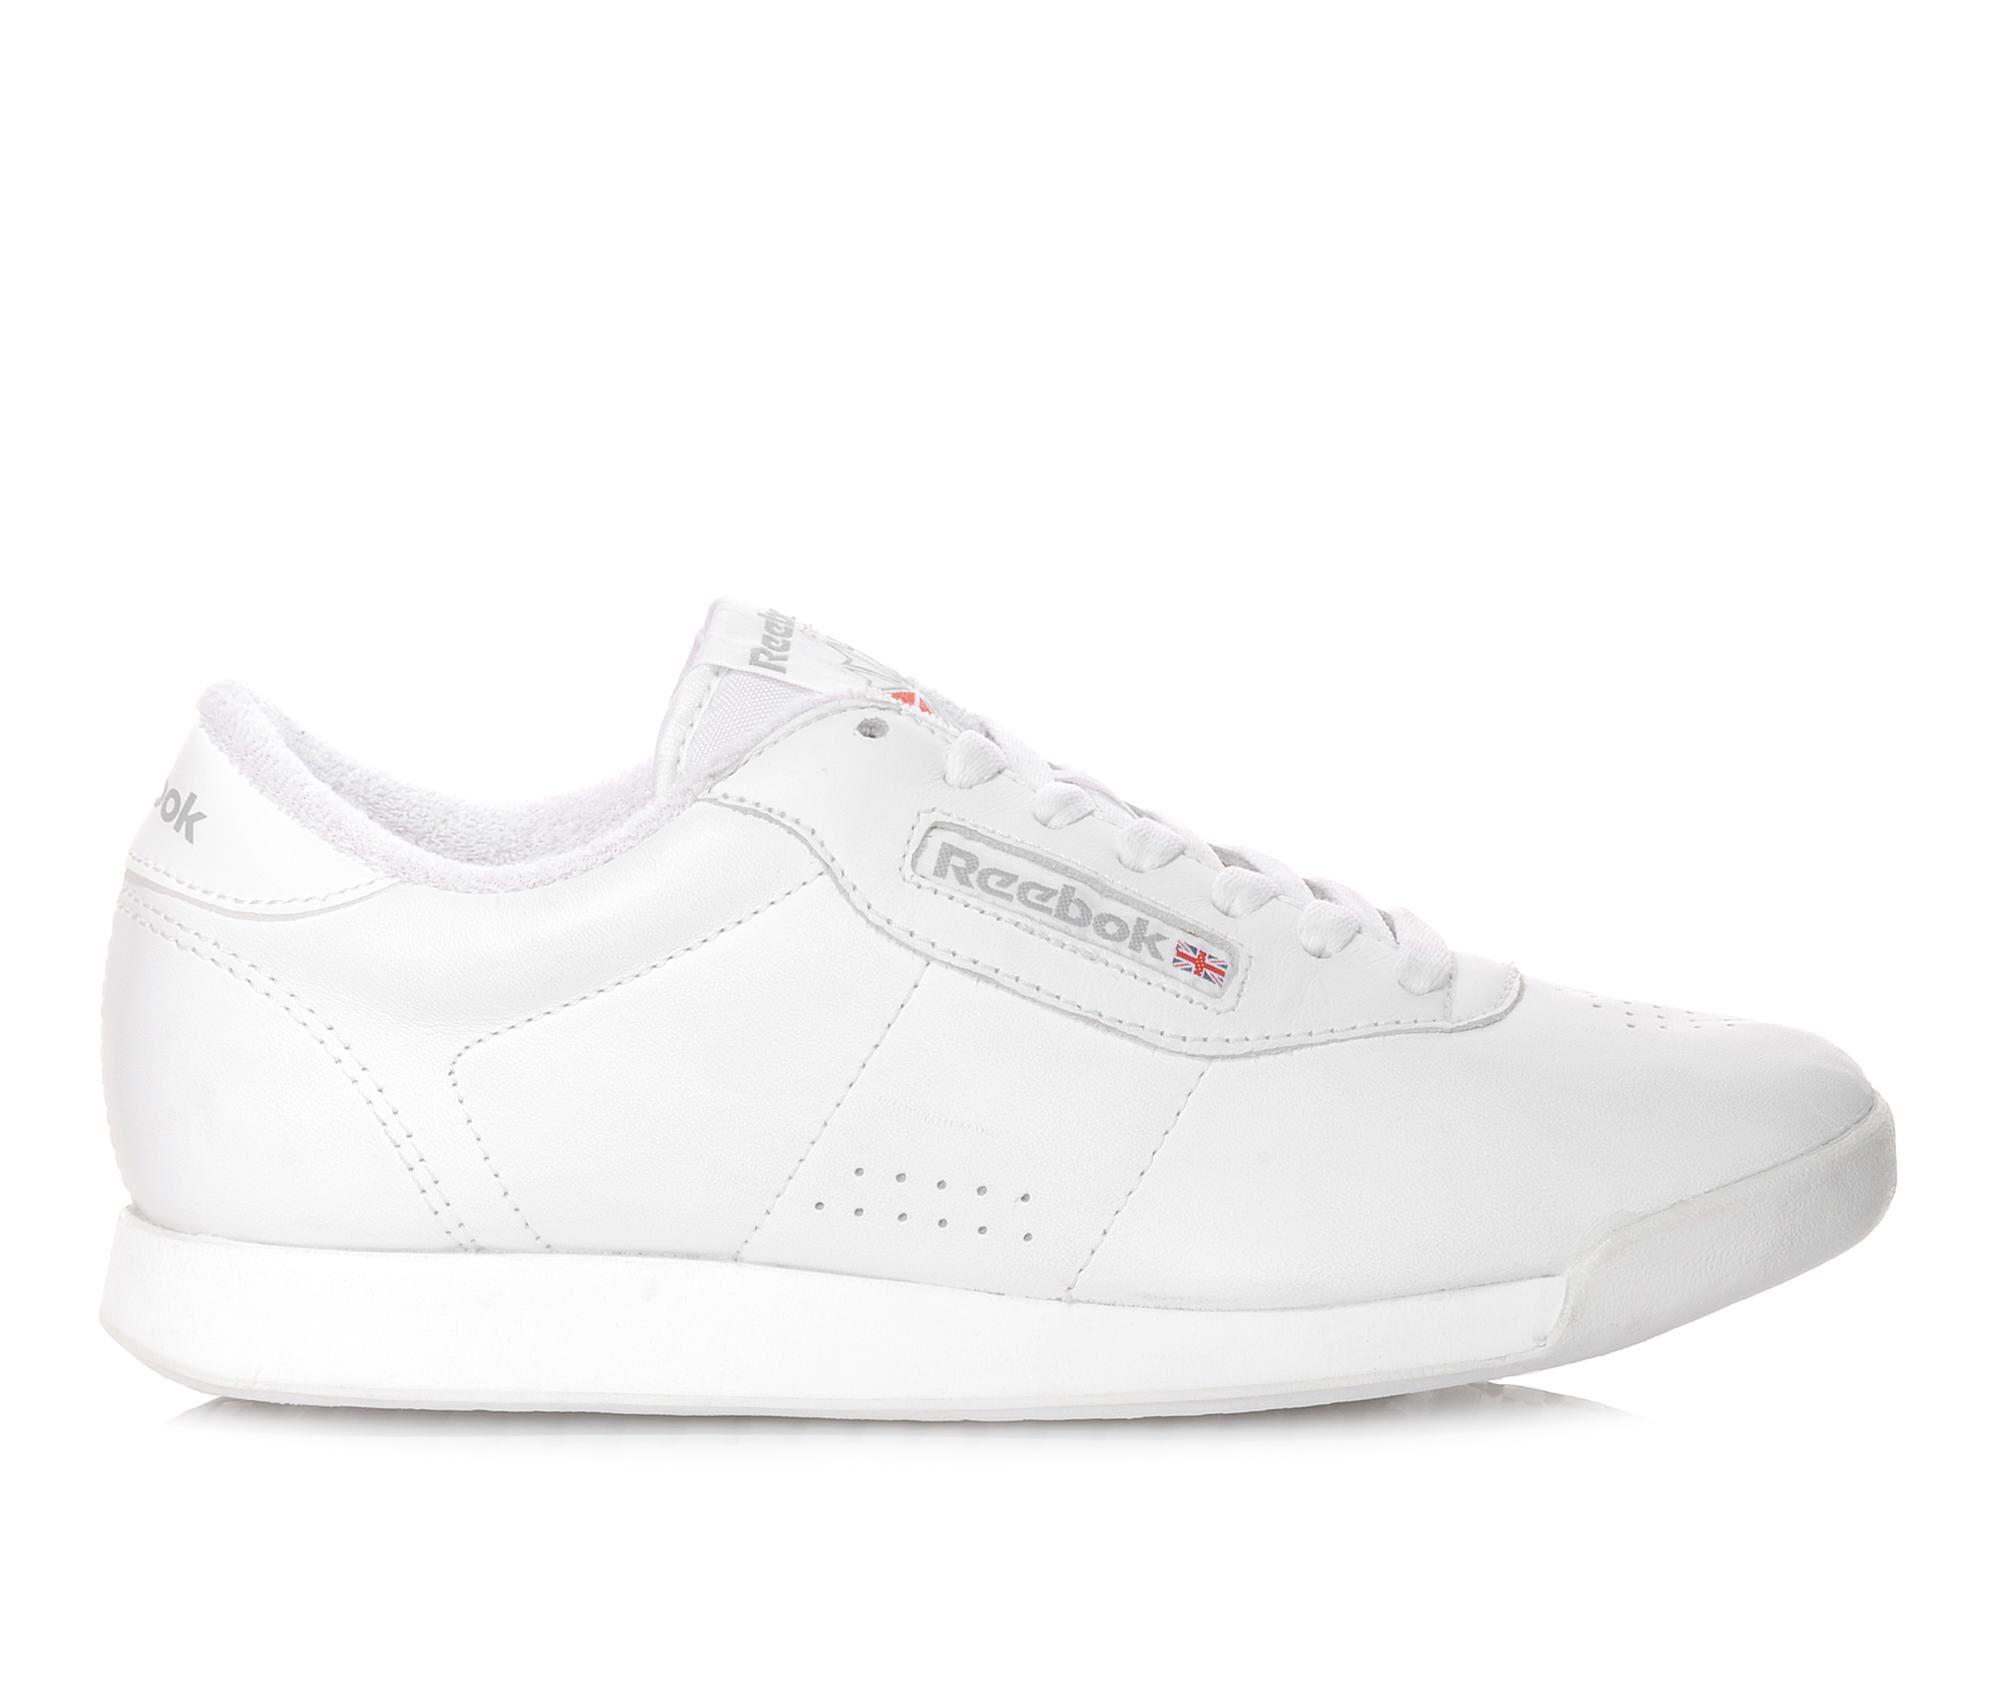 new series Women's Reebok Princess II Retro Sneakers White